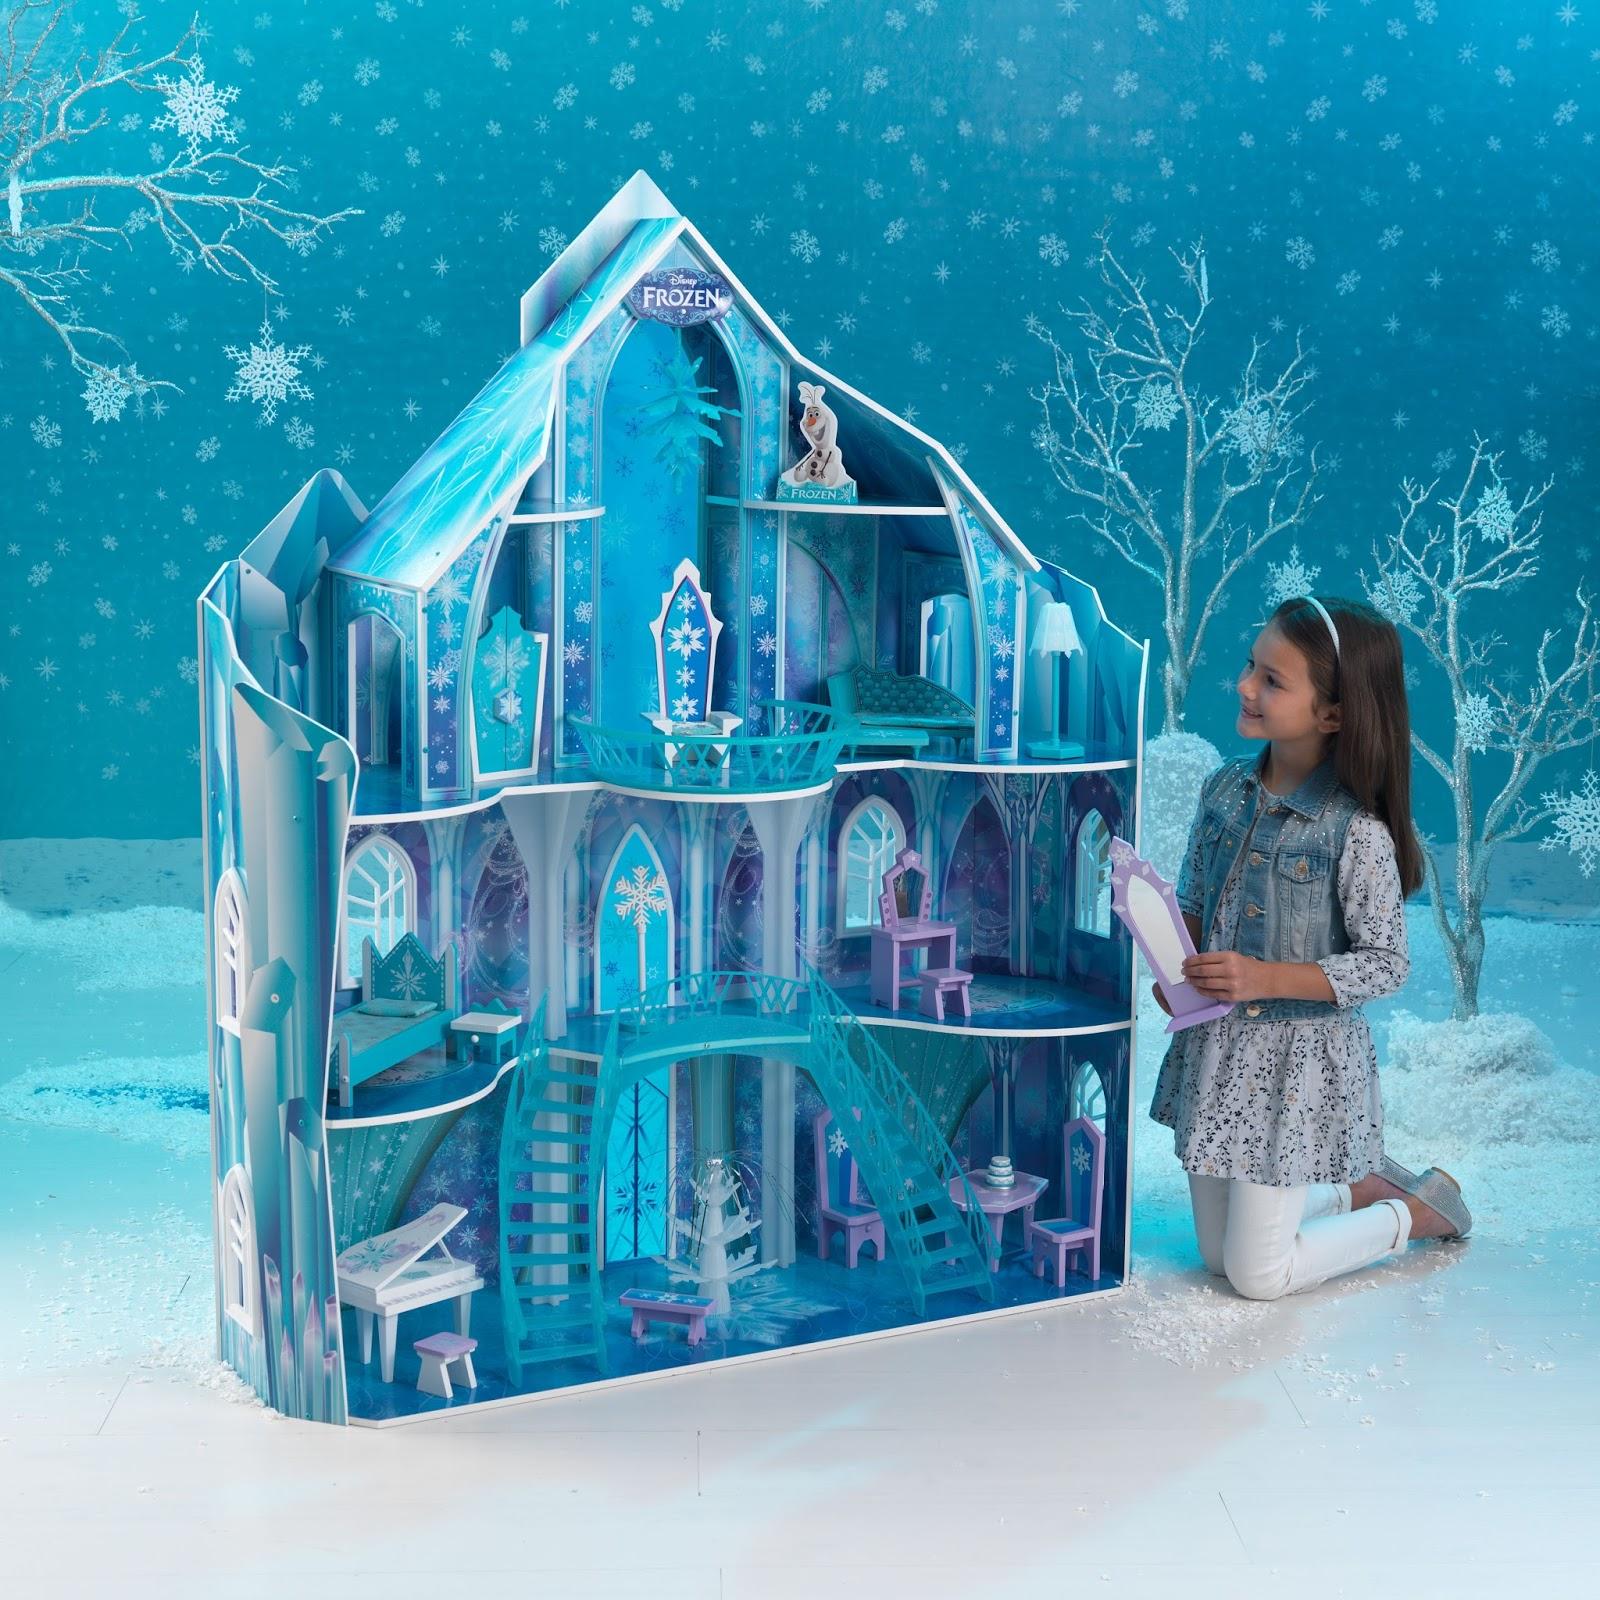 KidKraft Toys & Furniture: It's Here! The Disney® Frozen